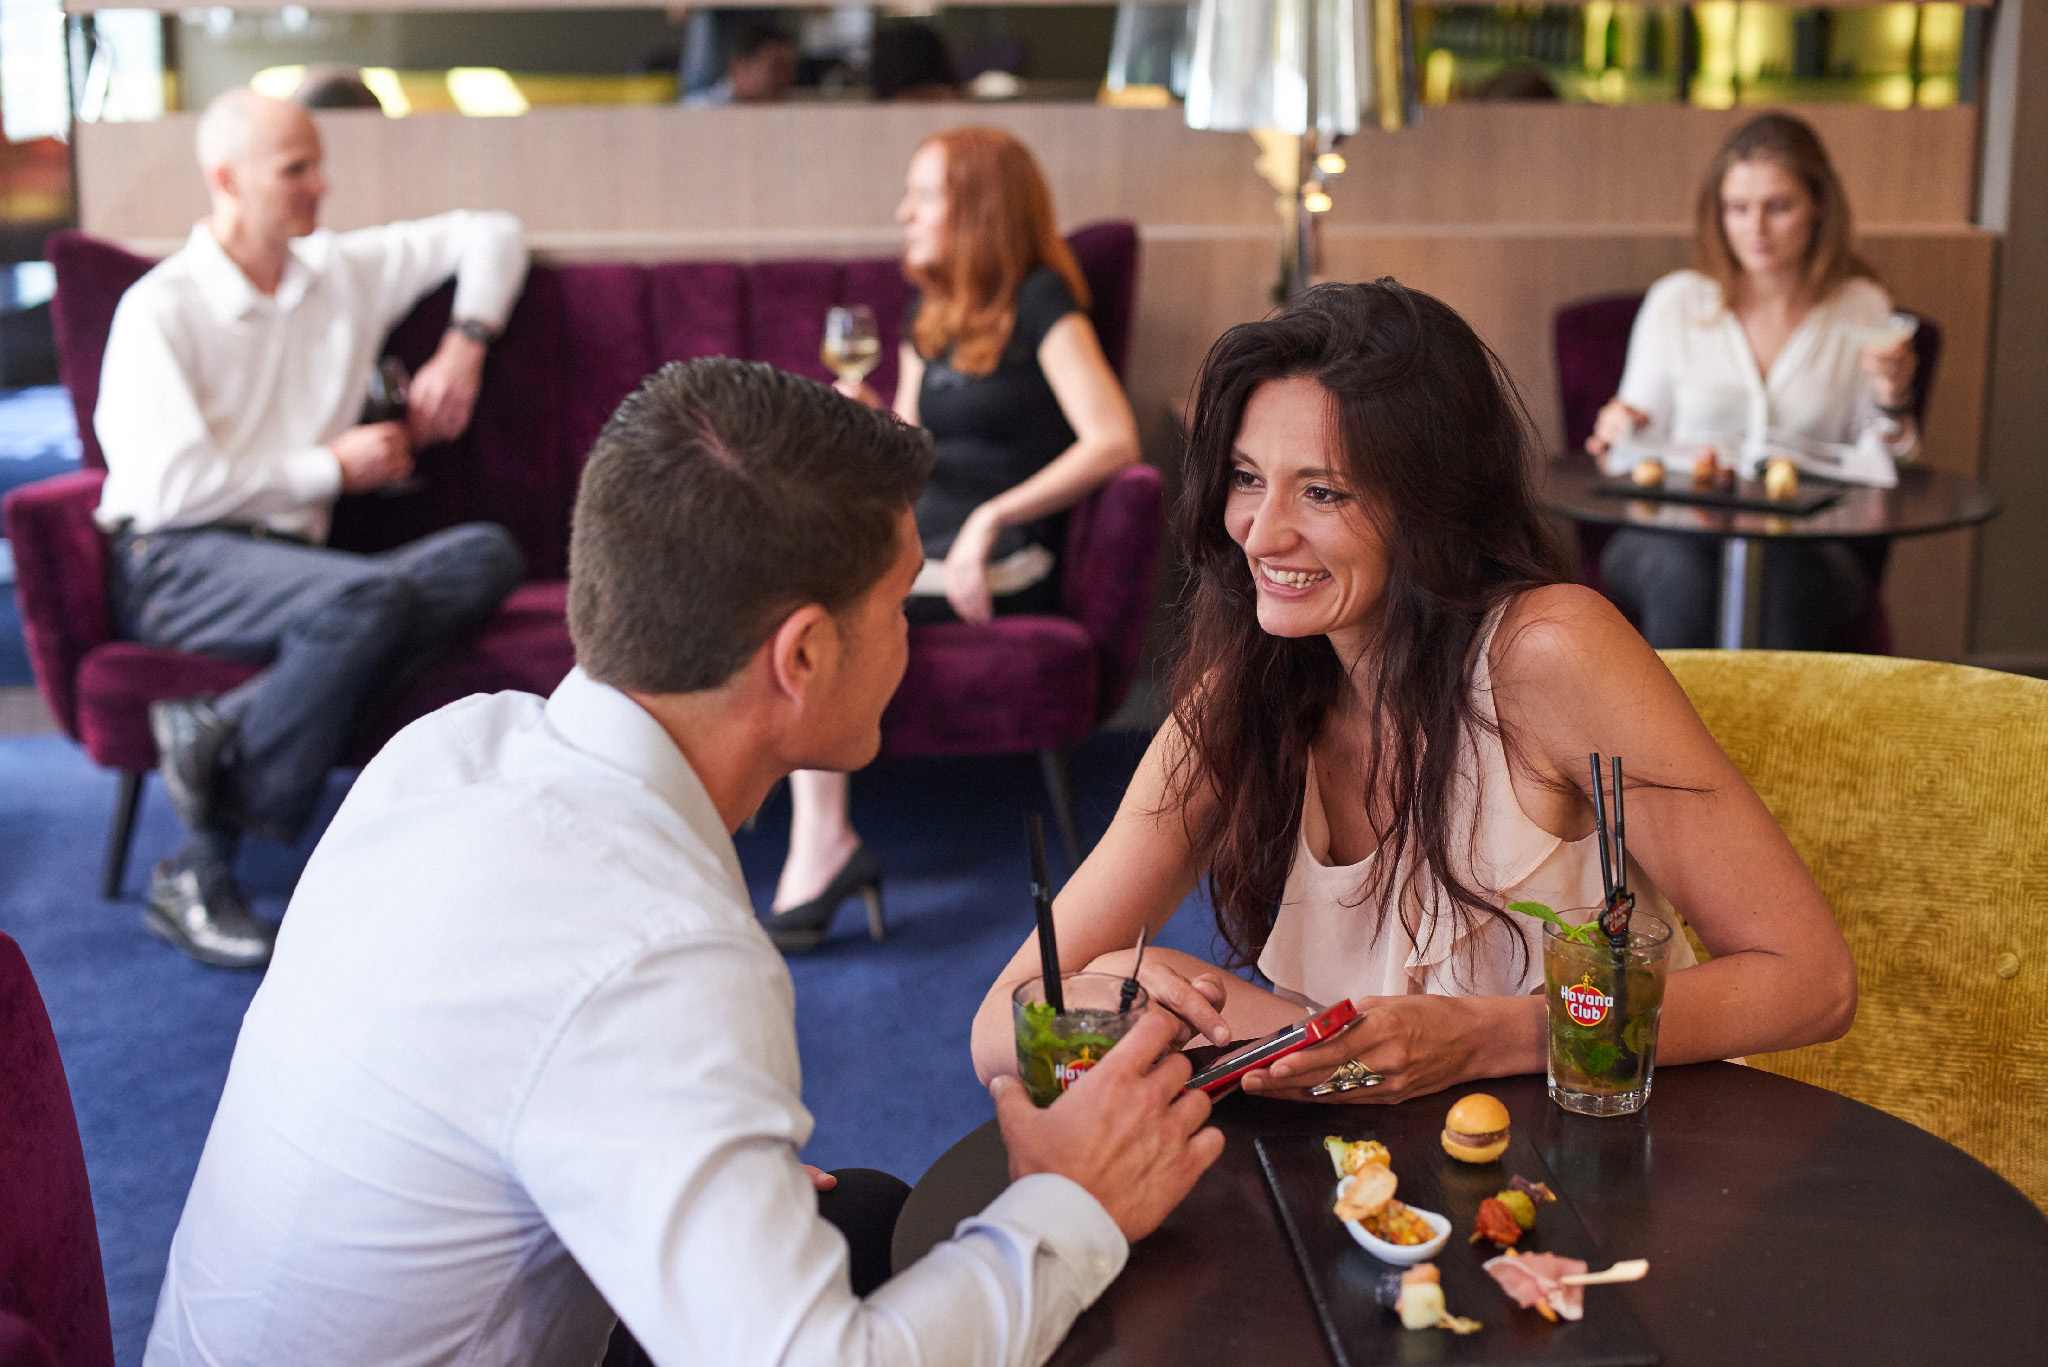 72_photographie_hotel_restaurant_nantes